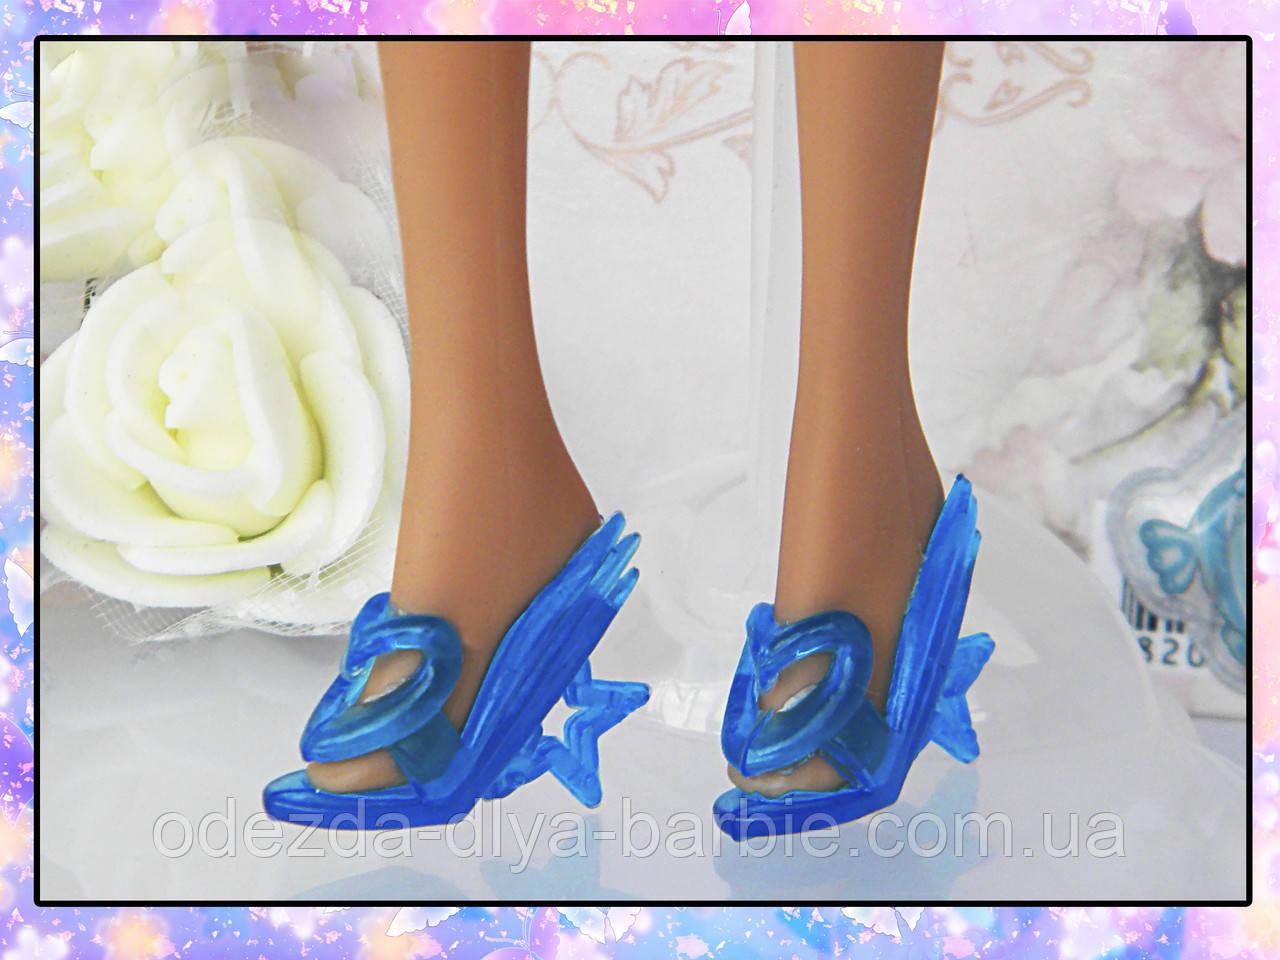 Обувь для Барби - шлёпанцы